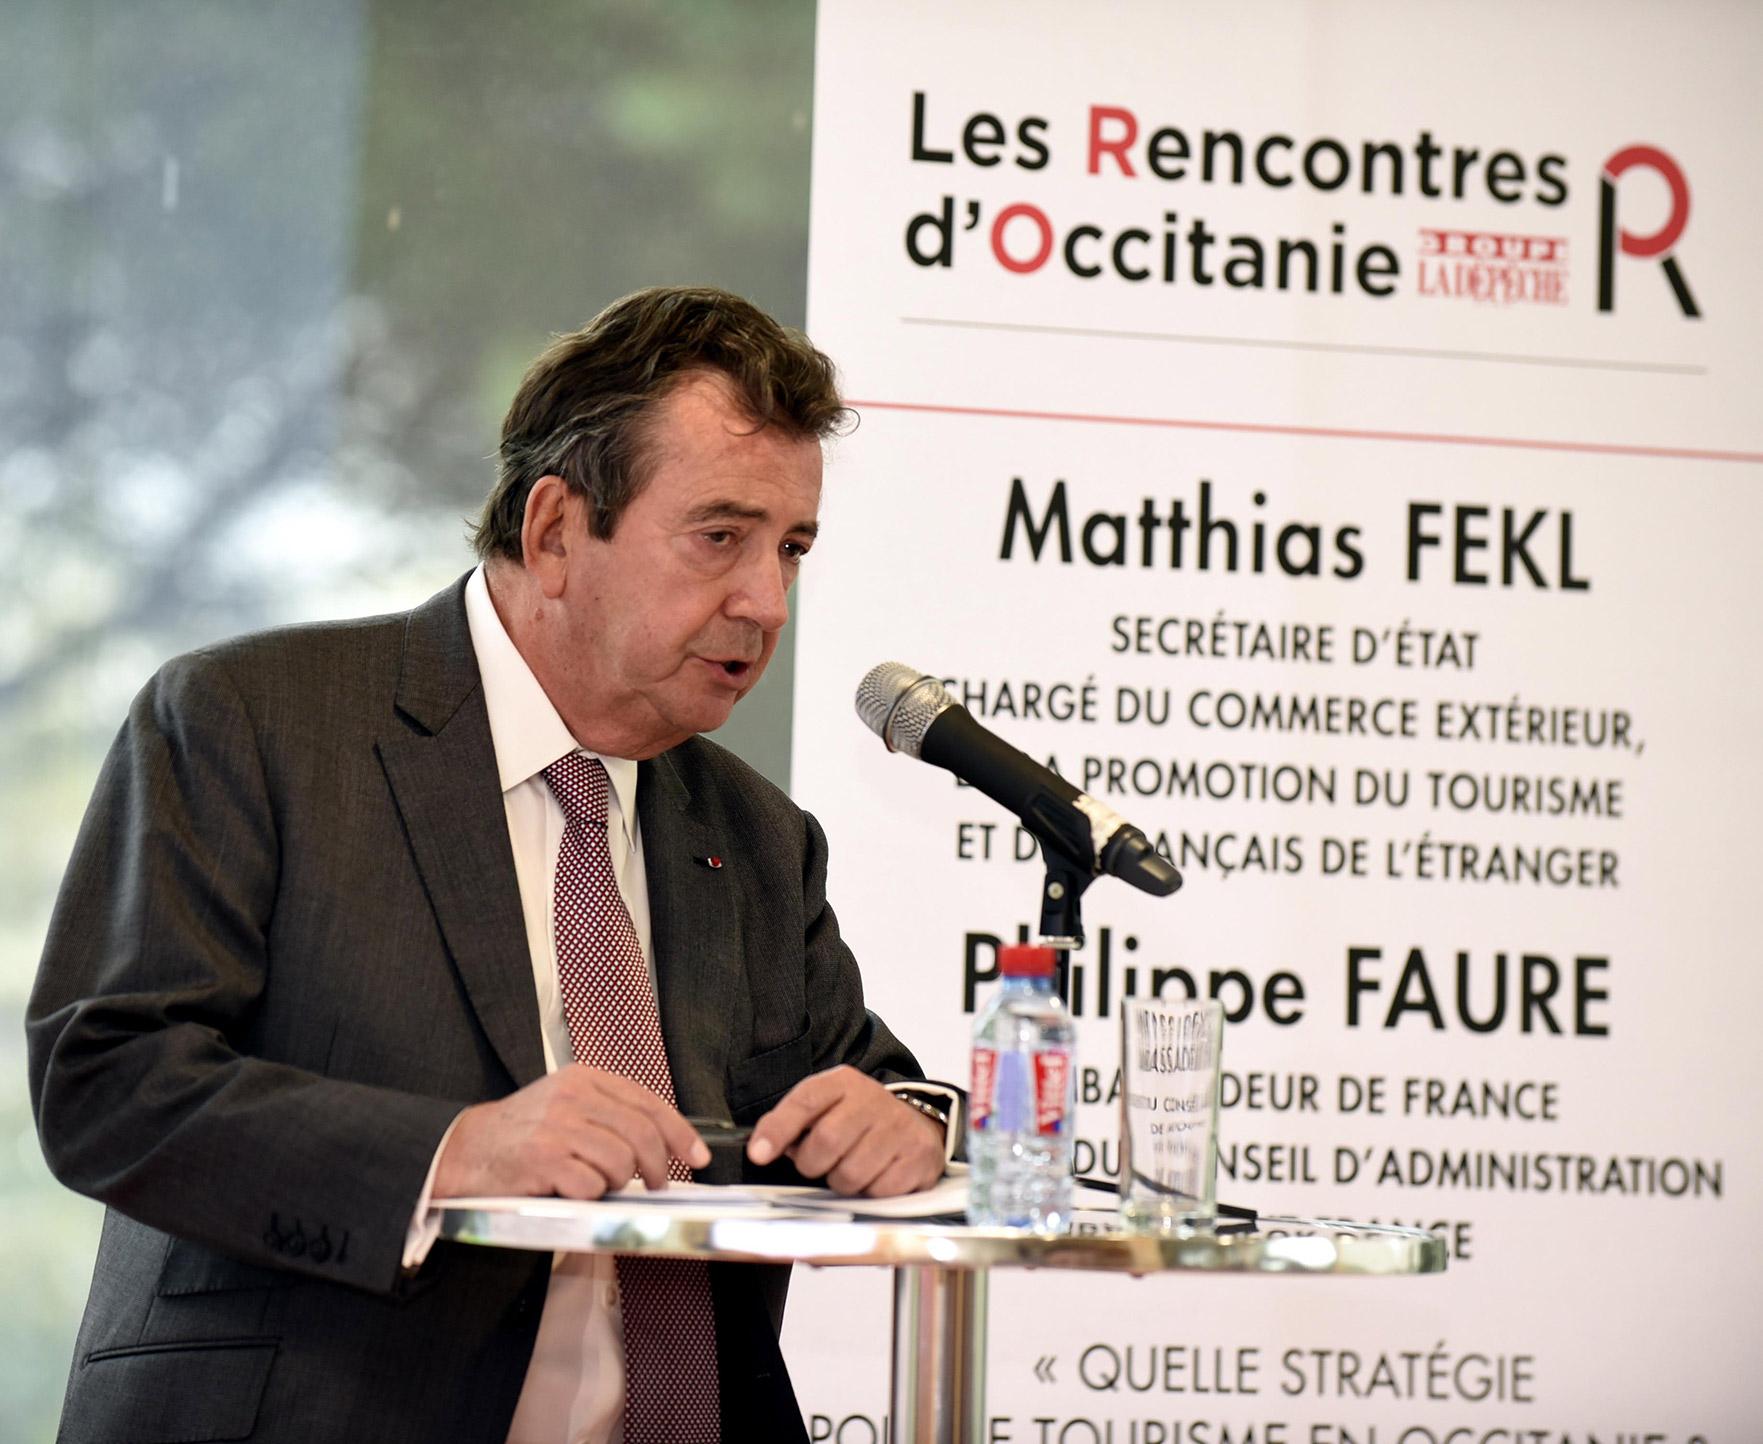 Philippe Faure